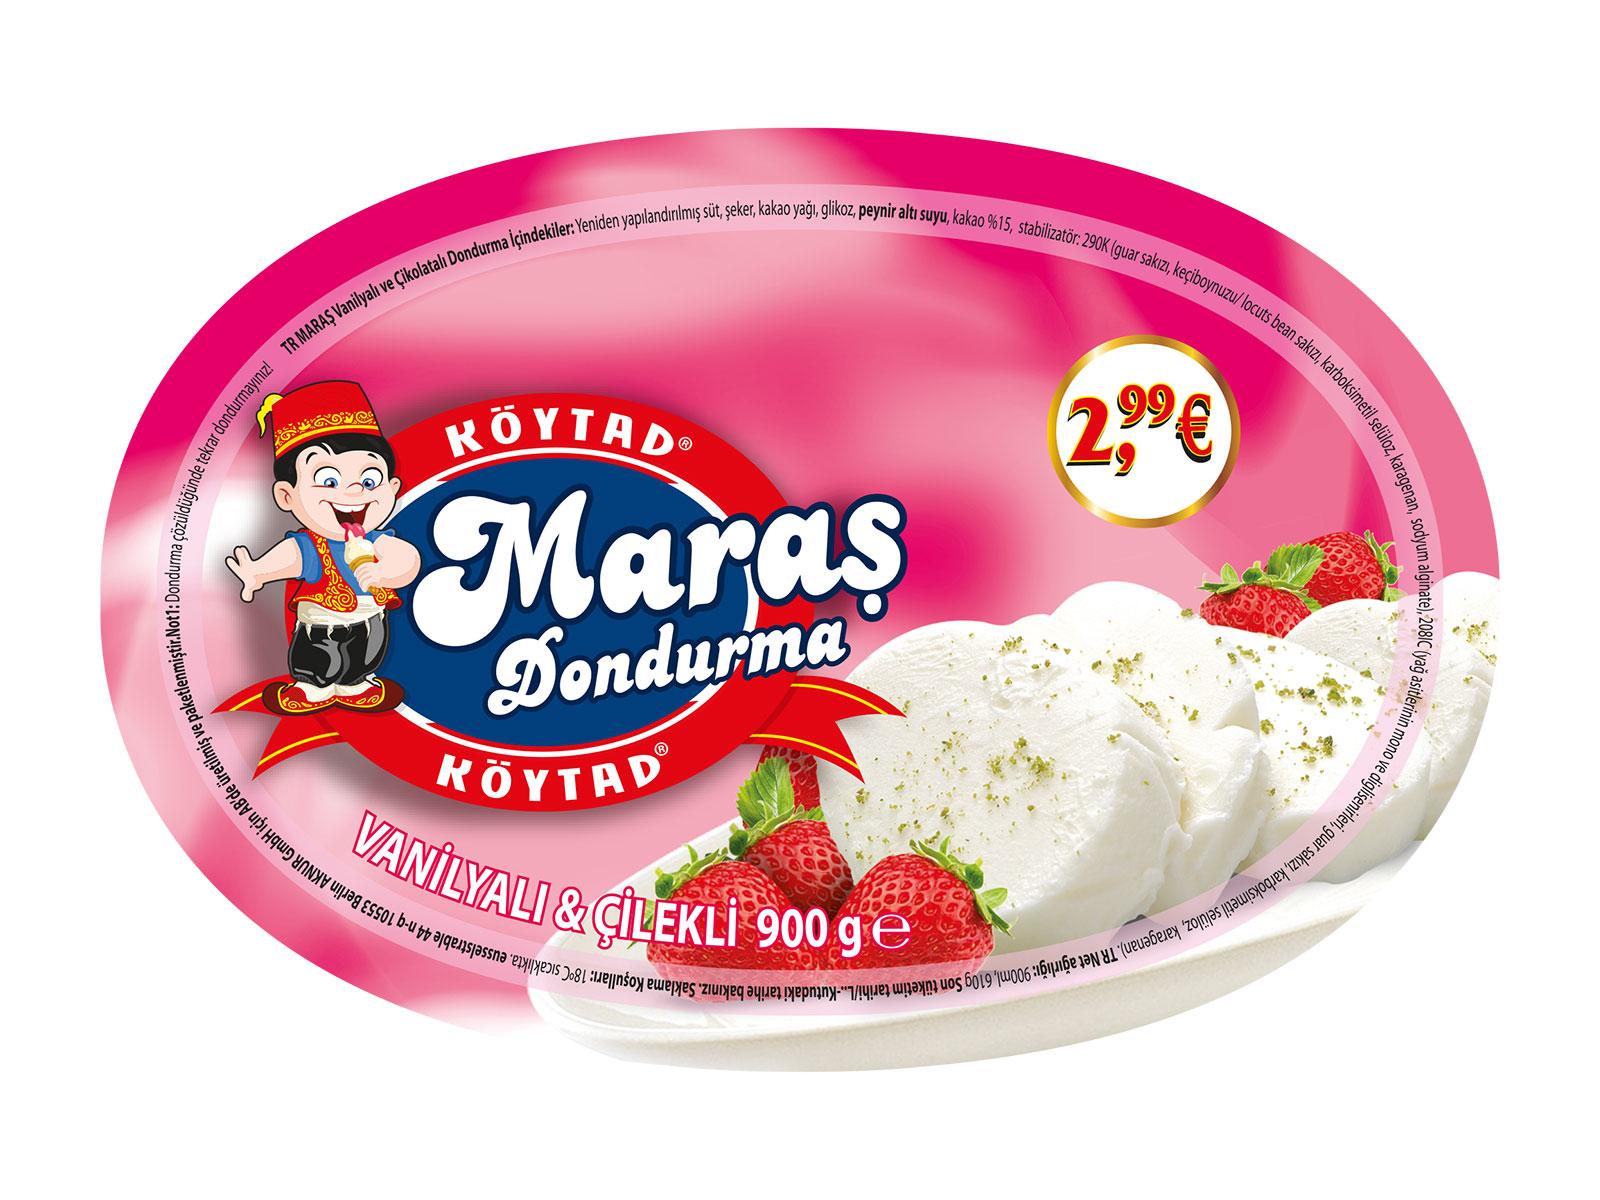 Koytad-Maras-Dondurma-Vanilyali-Cilekli-2